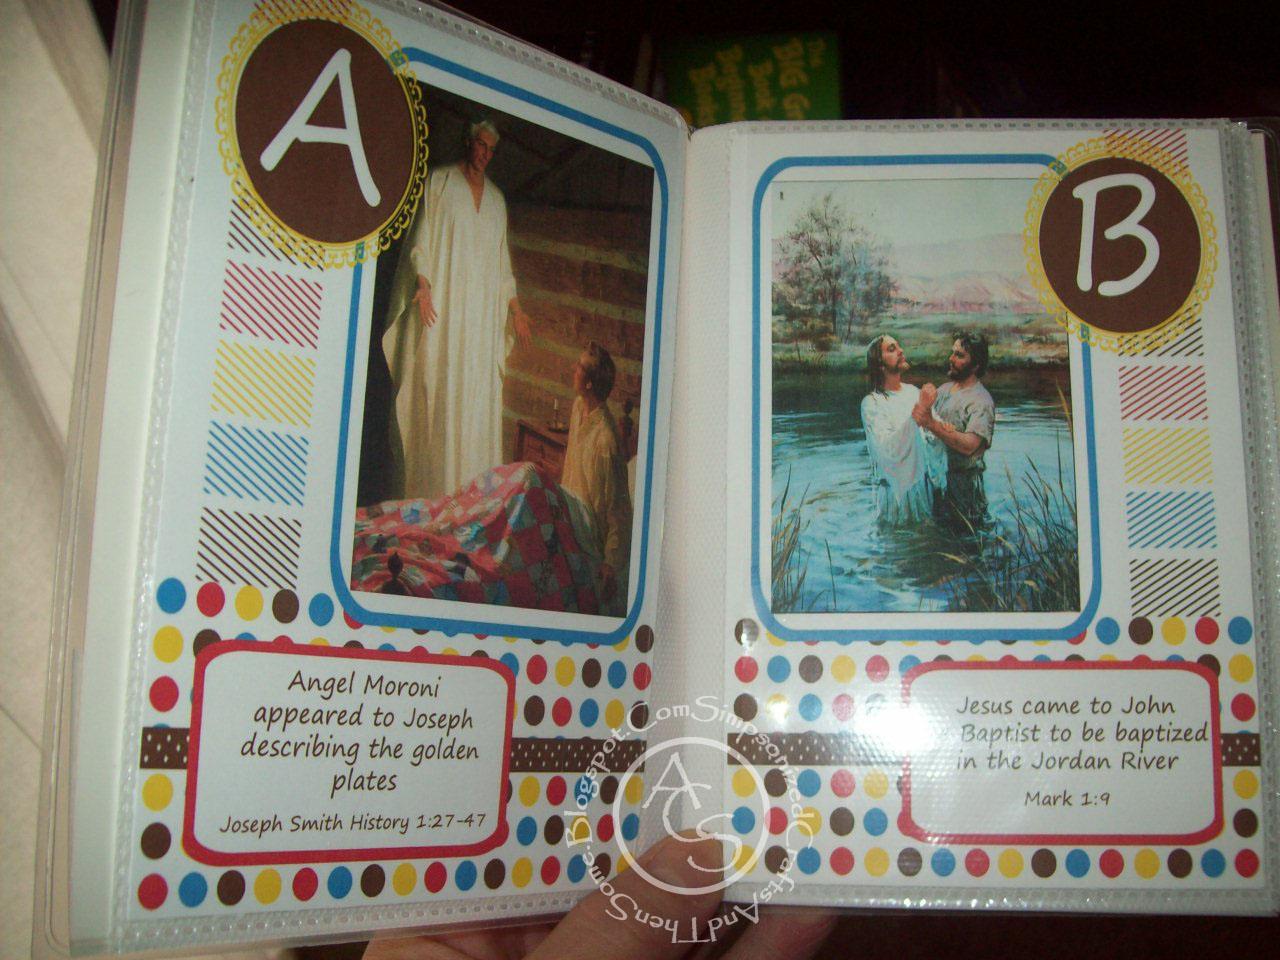 Scrapbook ideas abc album - Printable Abc Church Quiet Book Latter Day Saints